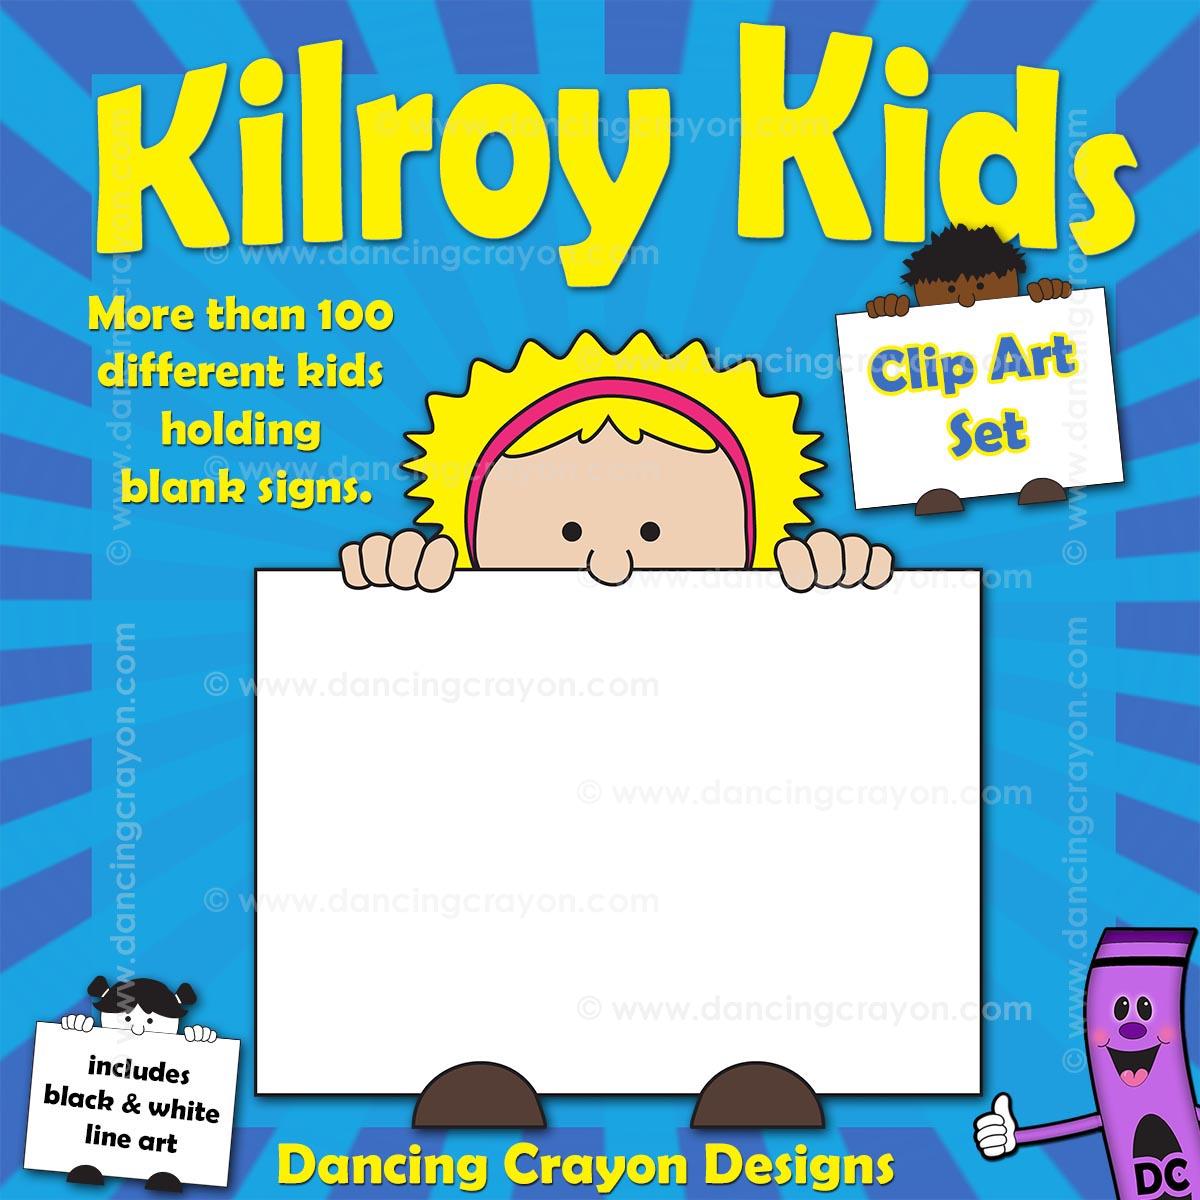 what clip art would you choose dancing crayon designs